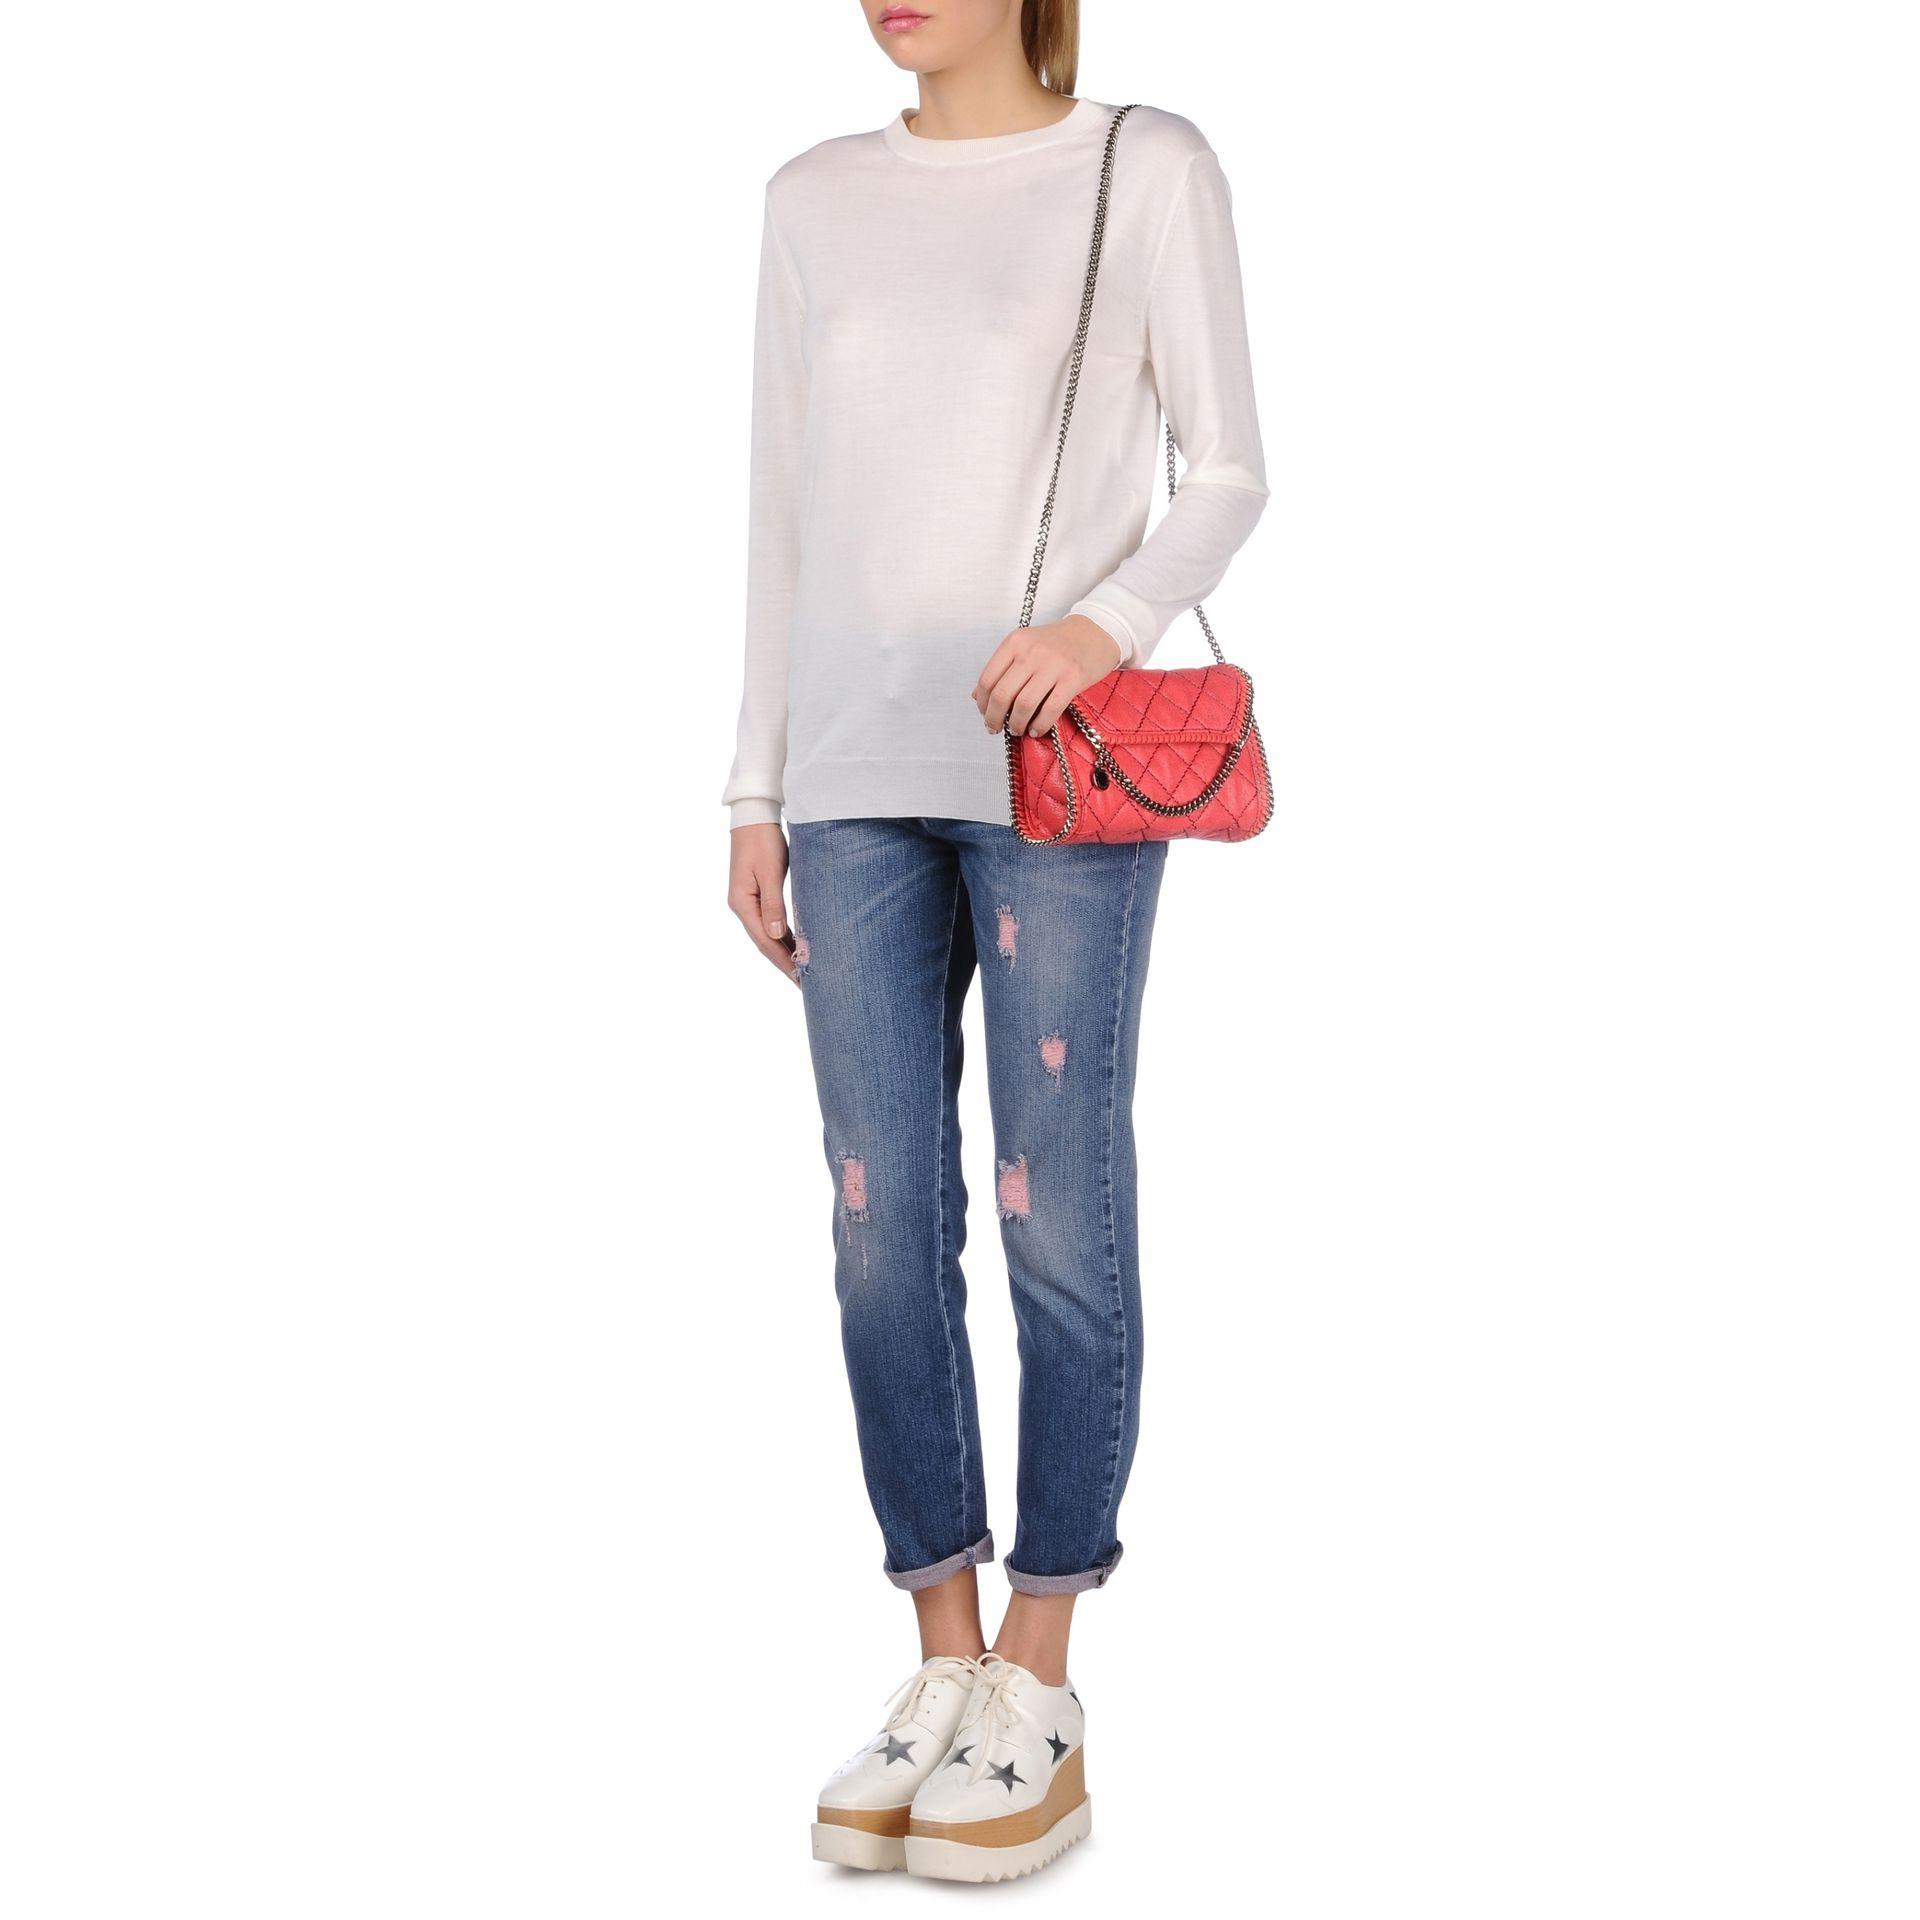 Lyst - Stella McCartney Falabella Quilted Mini Bag in Pink 3d6556e7cc3d6